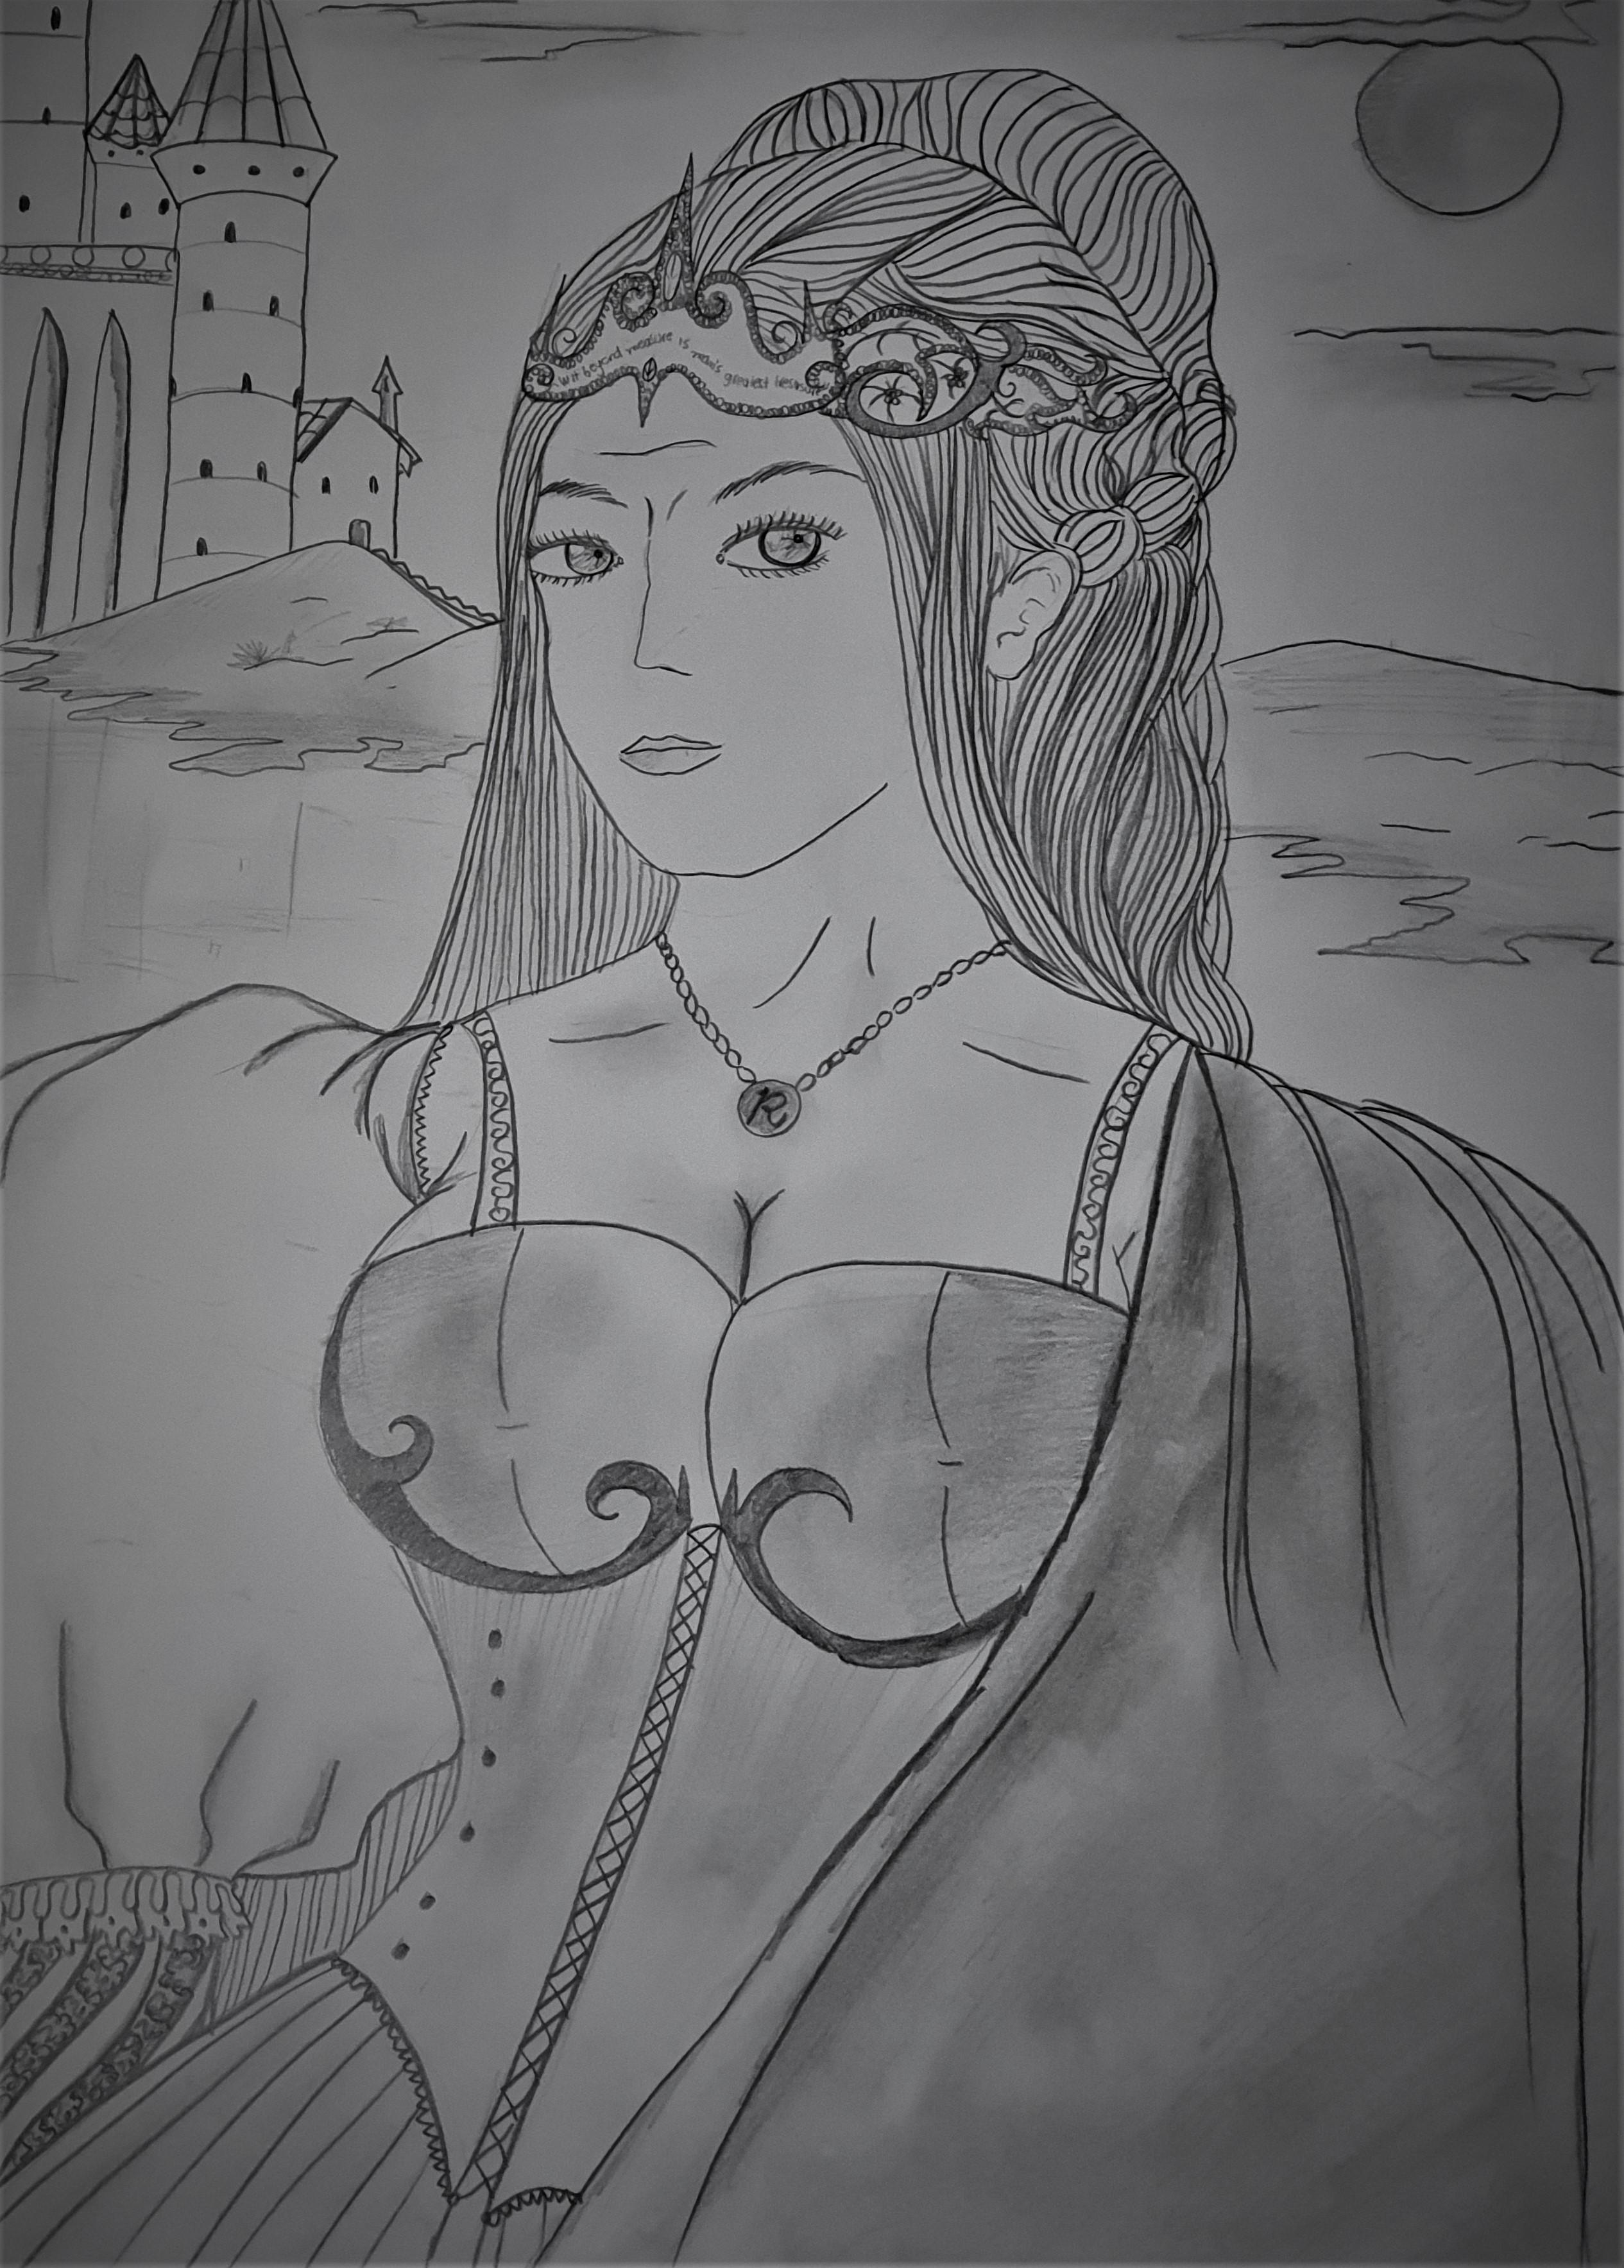 Rowena Ravenclaw - fanart inspirada no Mundo mágico de Harry Potter.